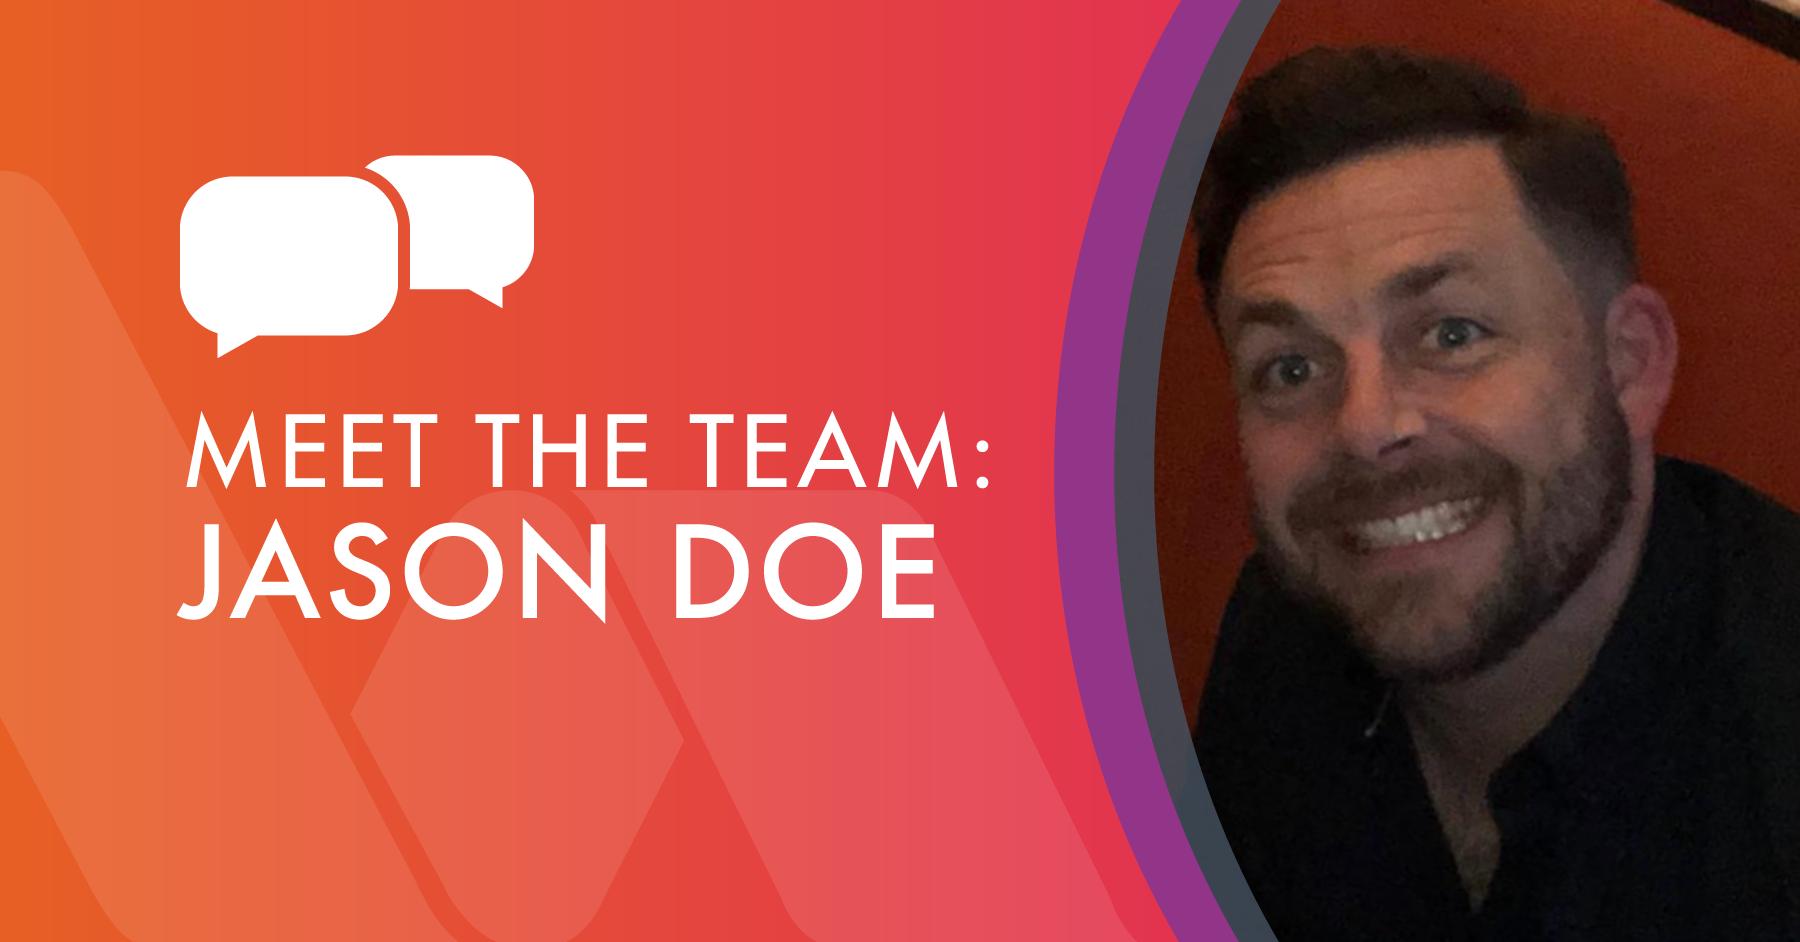 Meet the team - Jason Doe, Technical Engineer